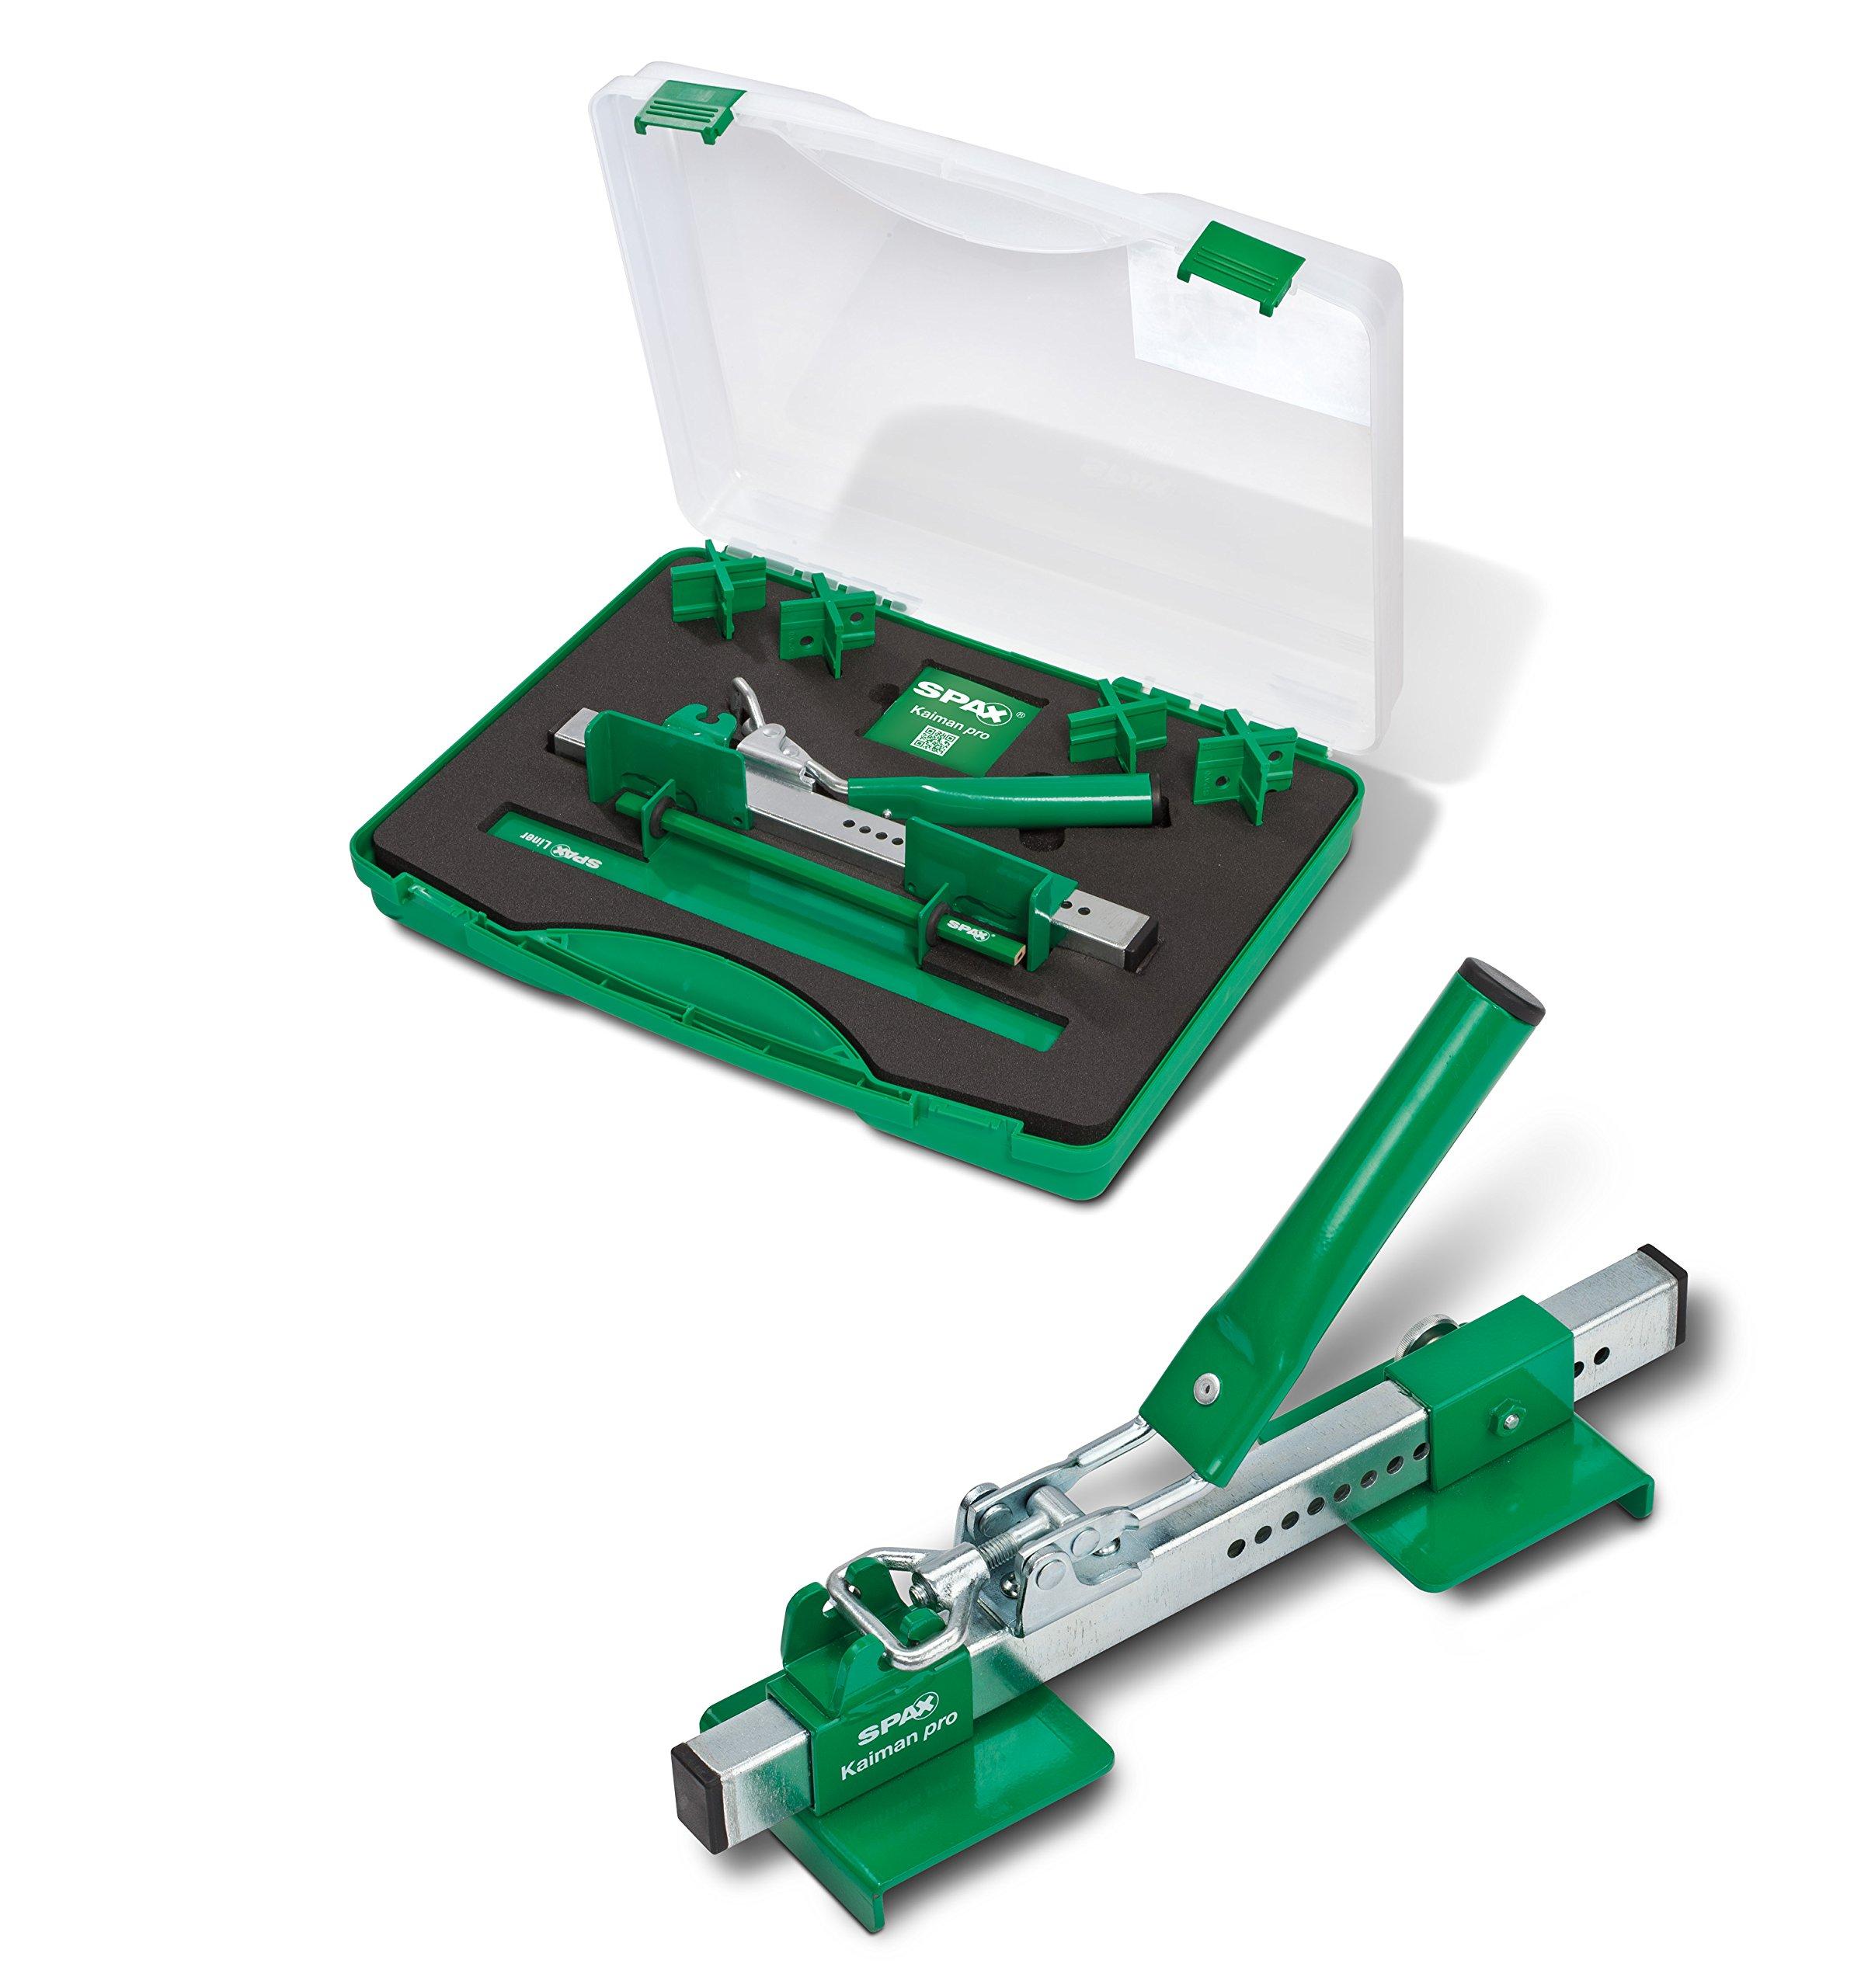 Spax–Richter Pro for Easy Alignment verzogener Caiman Deck Boards–5009409872009